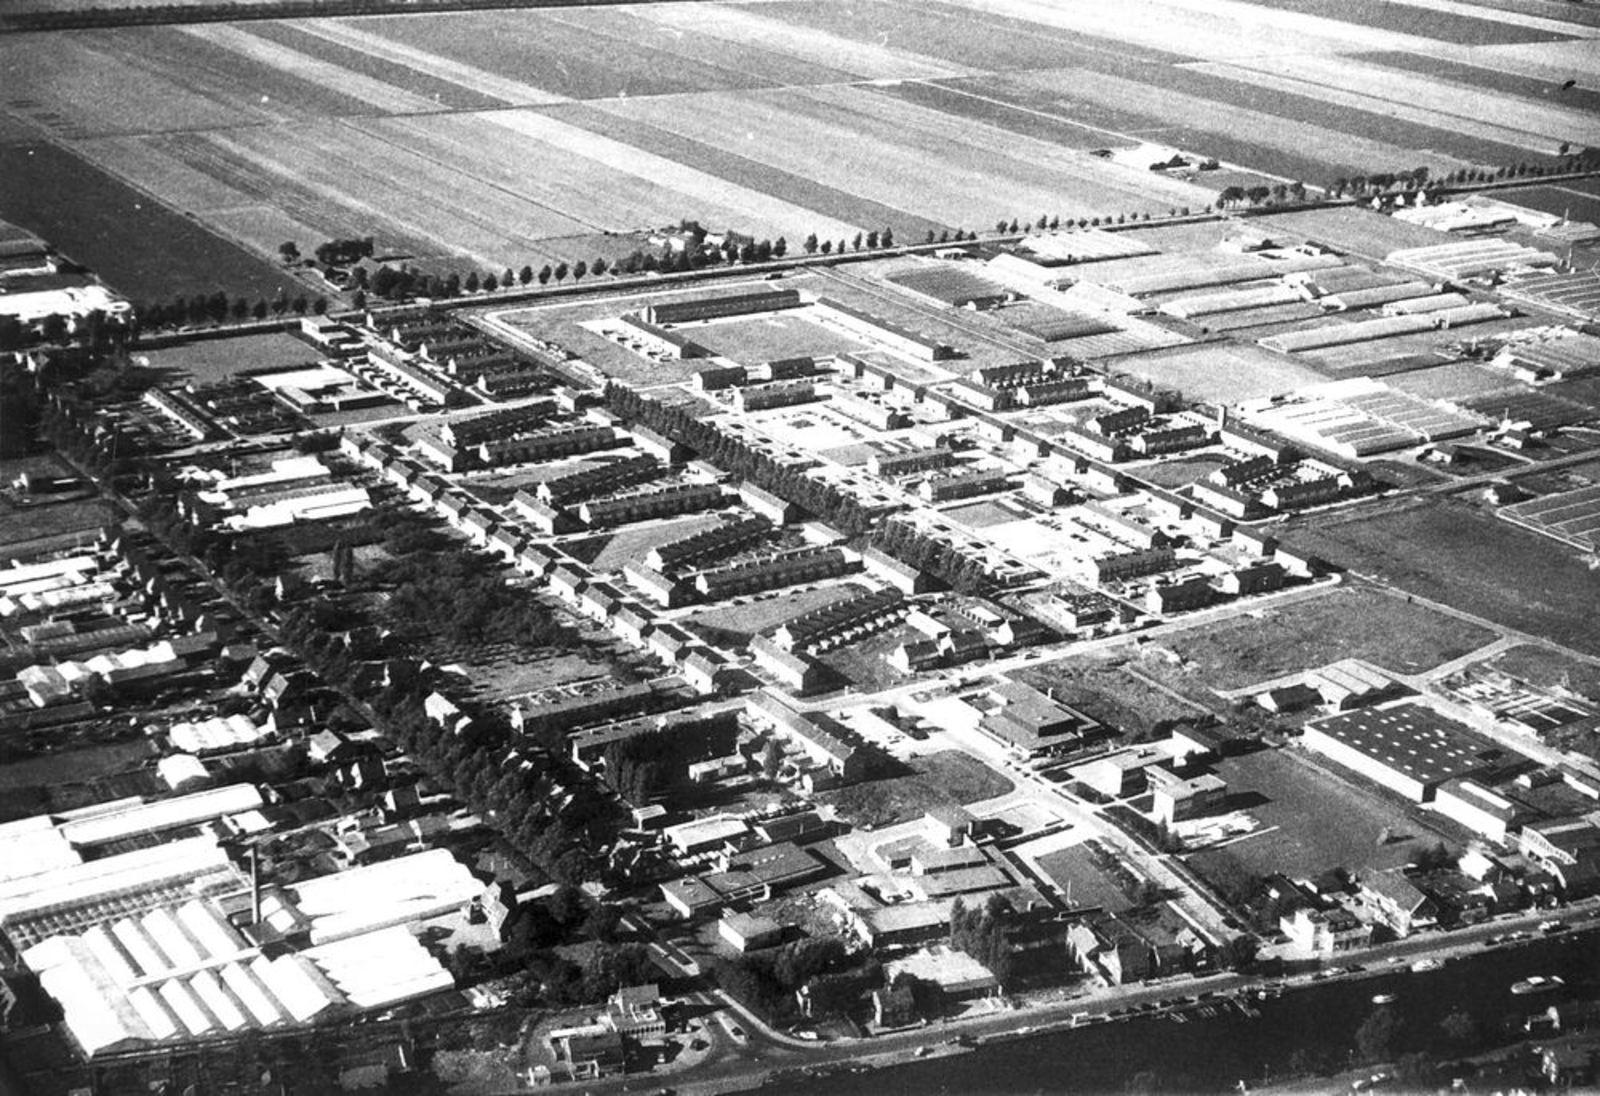 Rijsenhout 1970 Luchtfoto